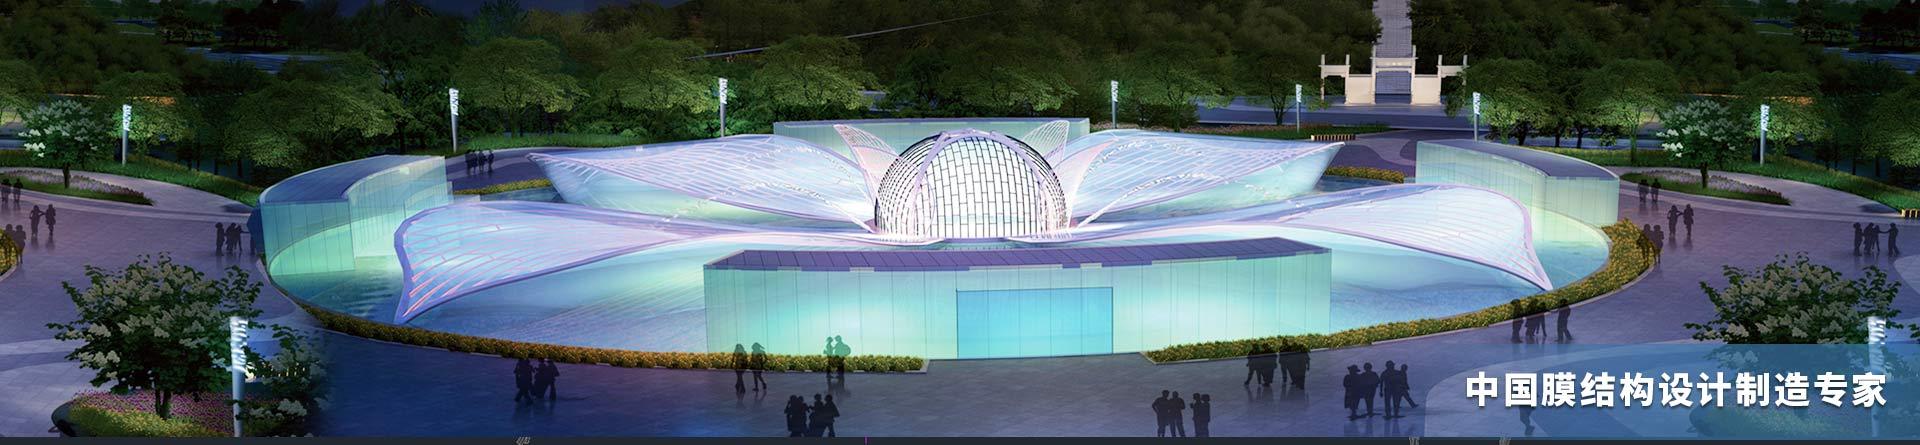 ETFE透明膜结构